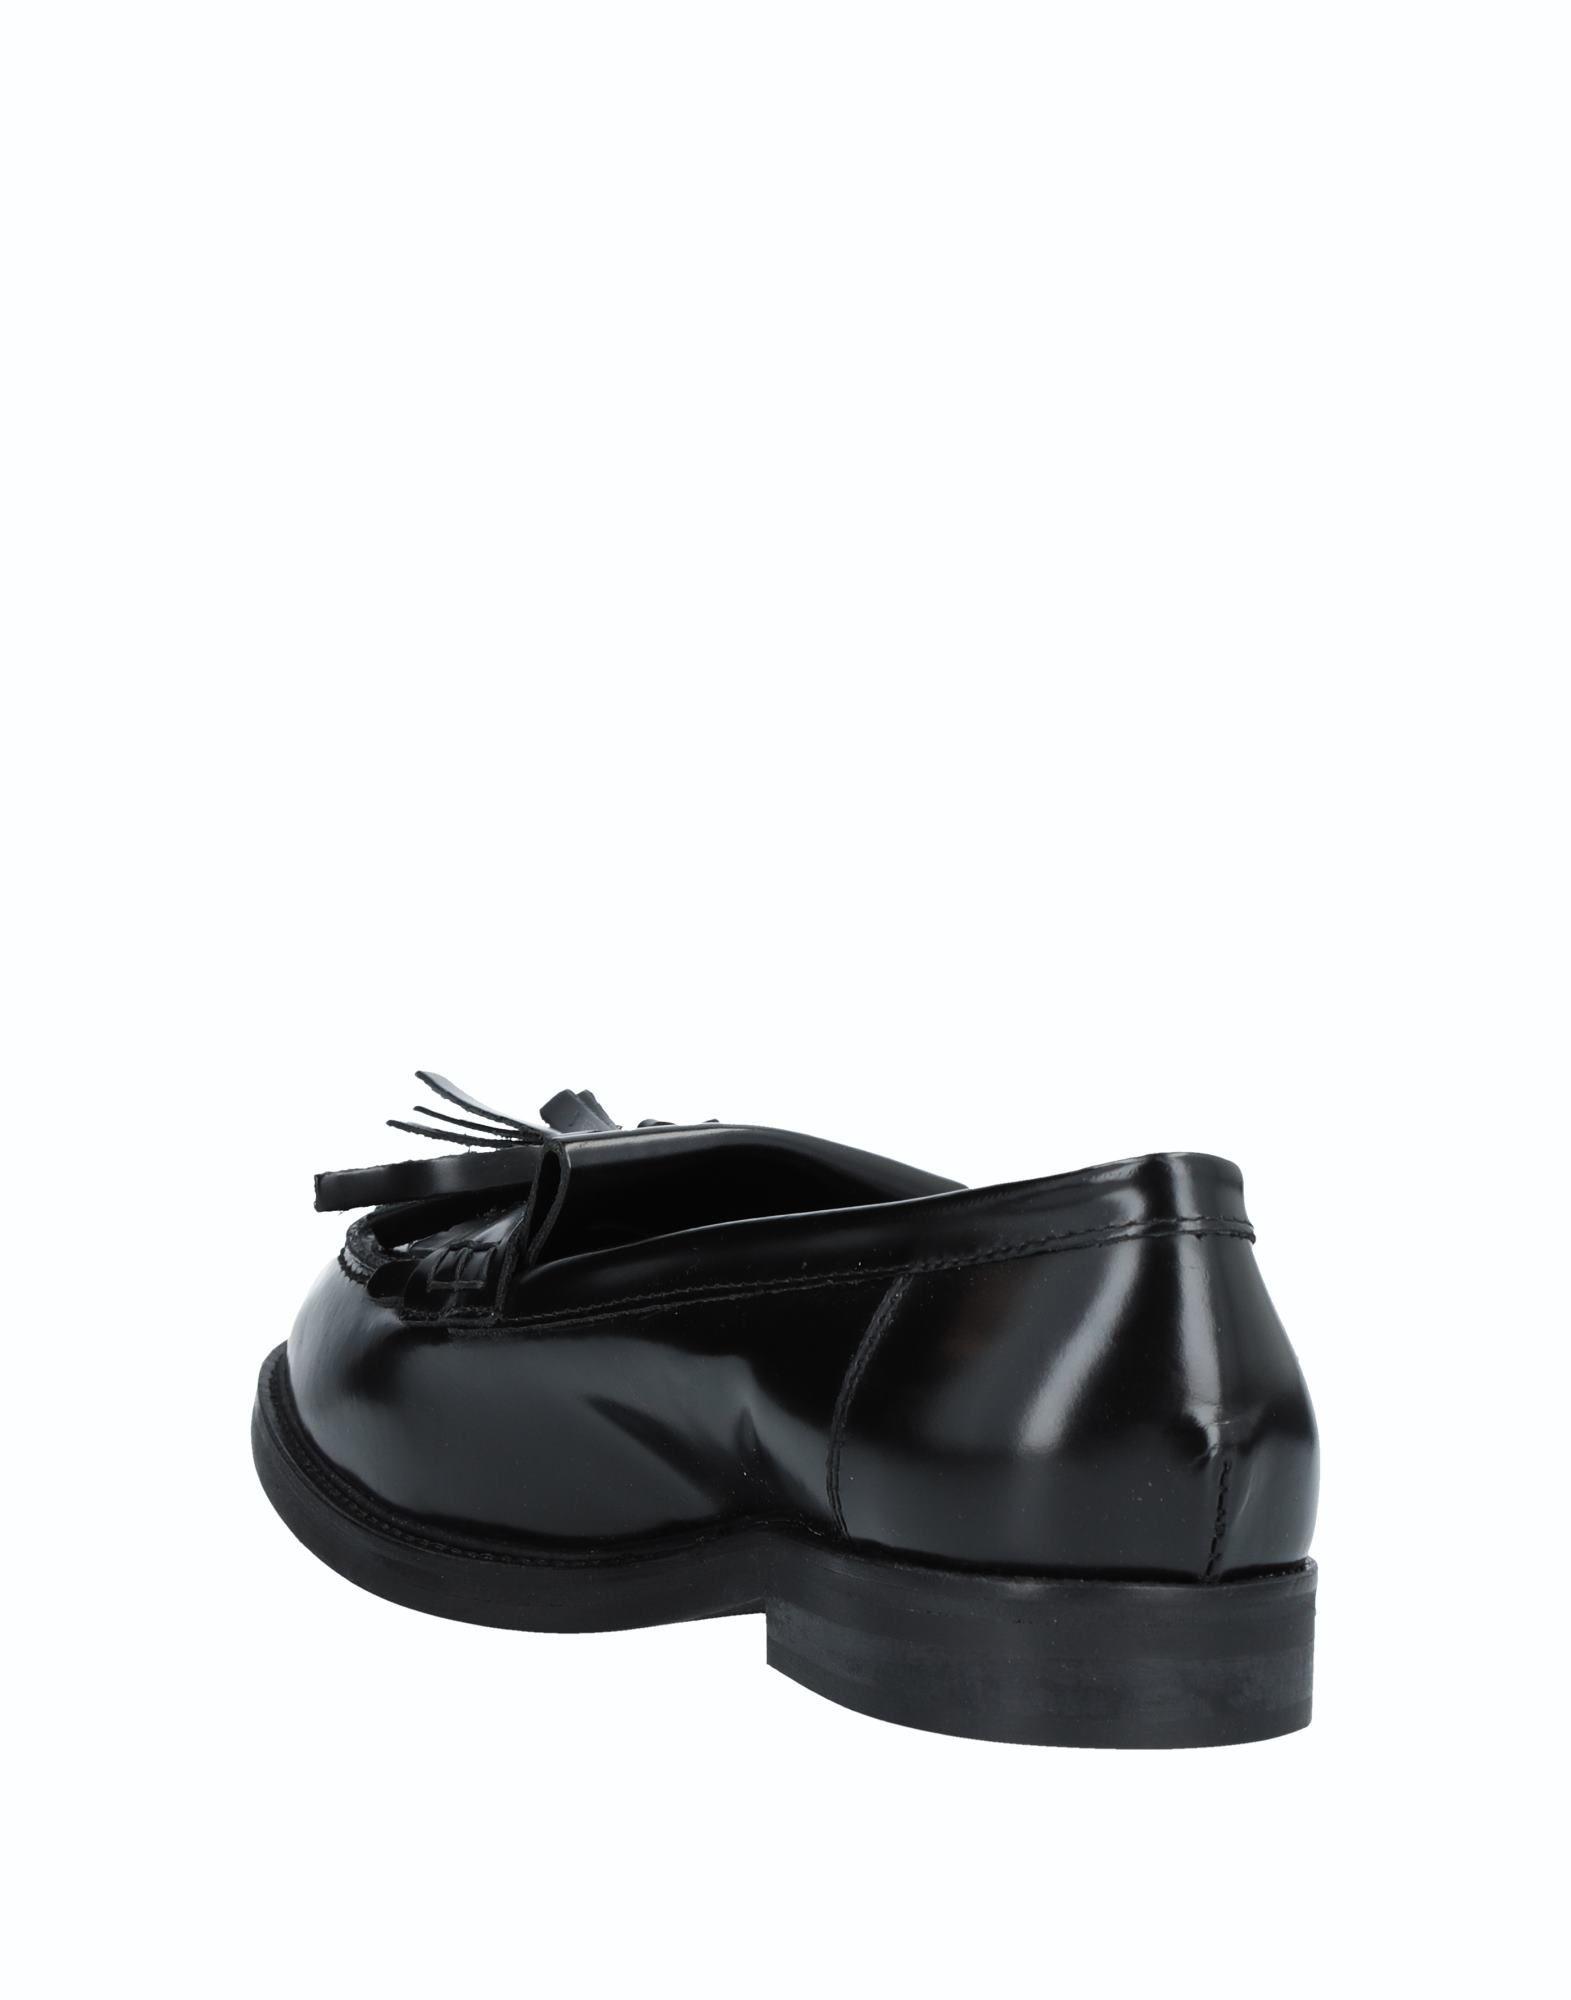 Paolina Damen Perez Mokassins Damen Paolina  11537642GT Neue Schuhe 4f9777